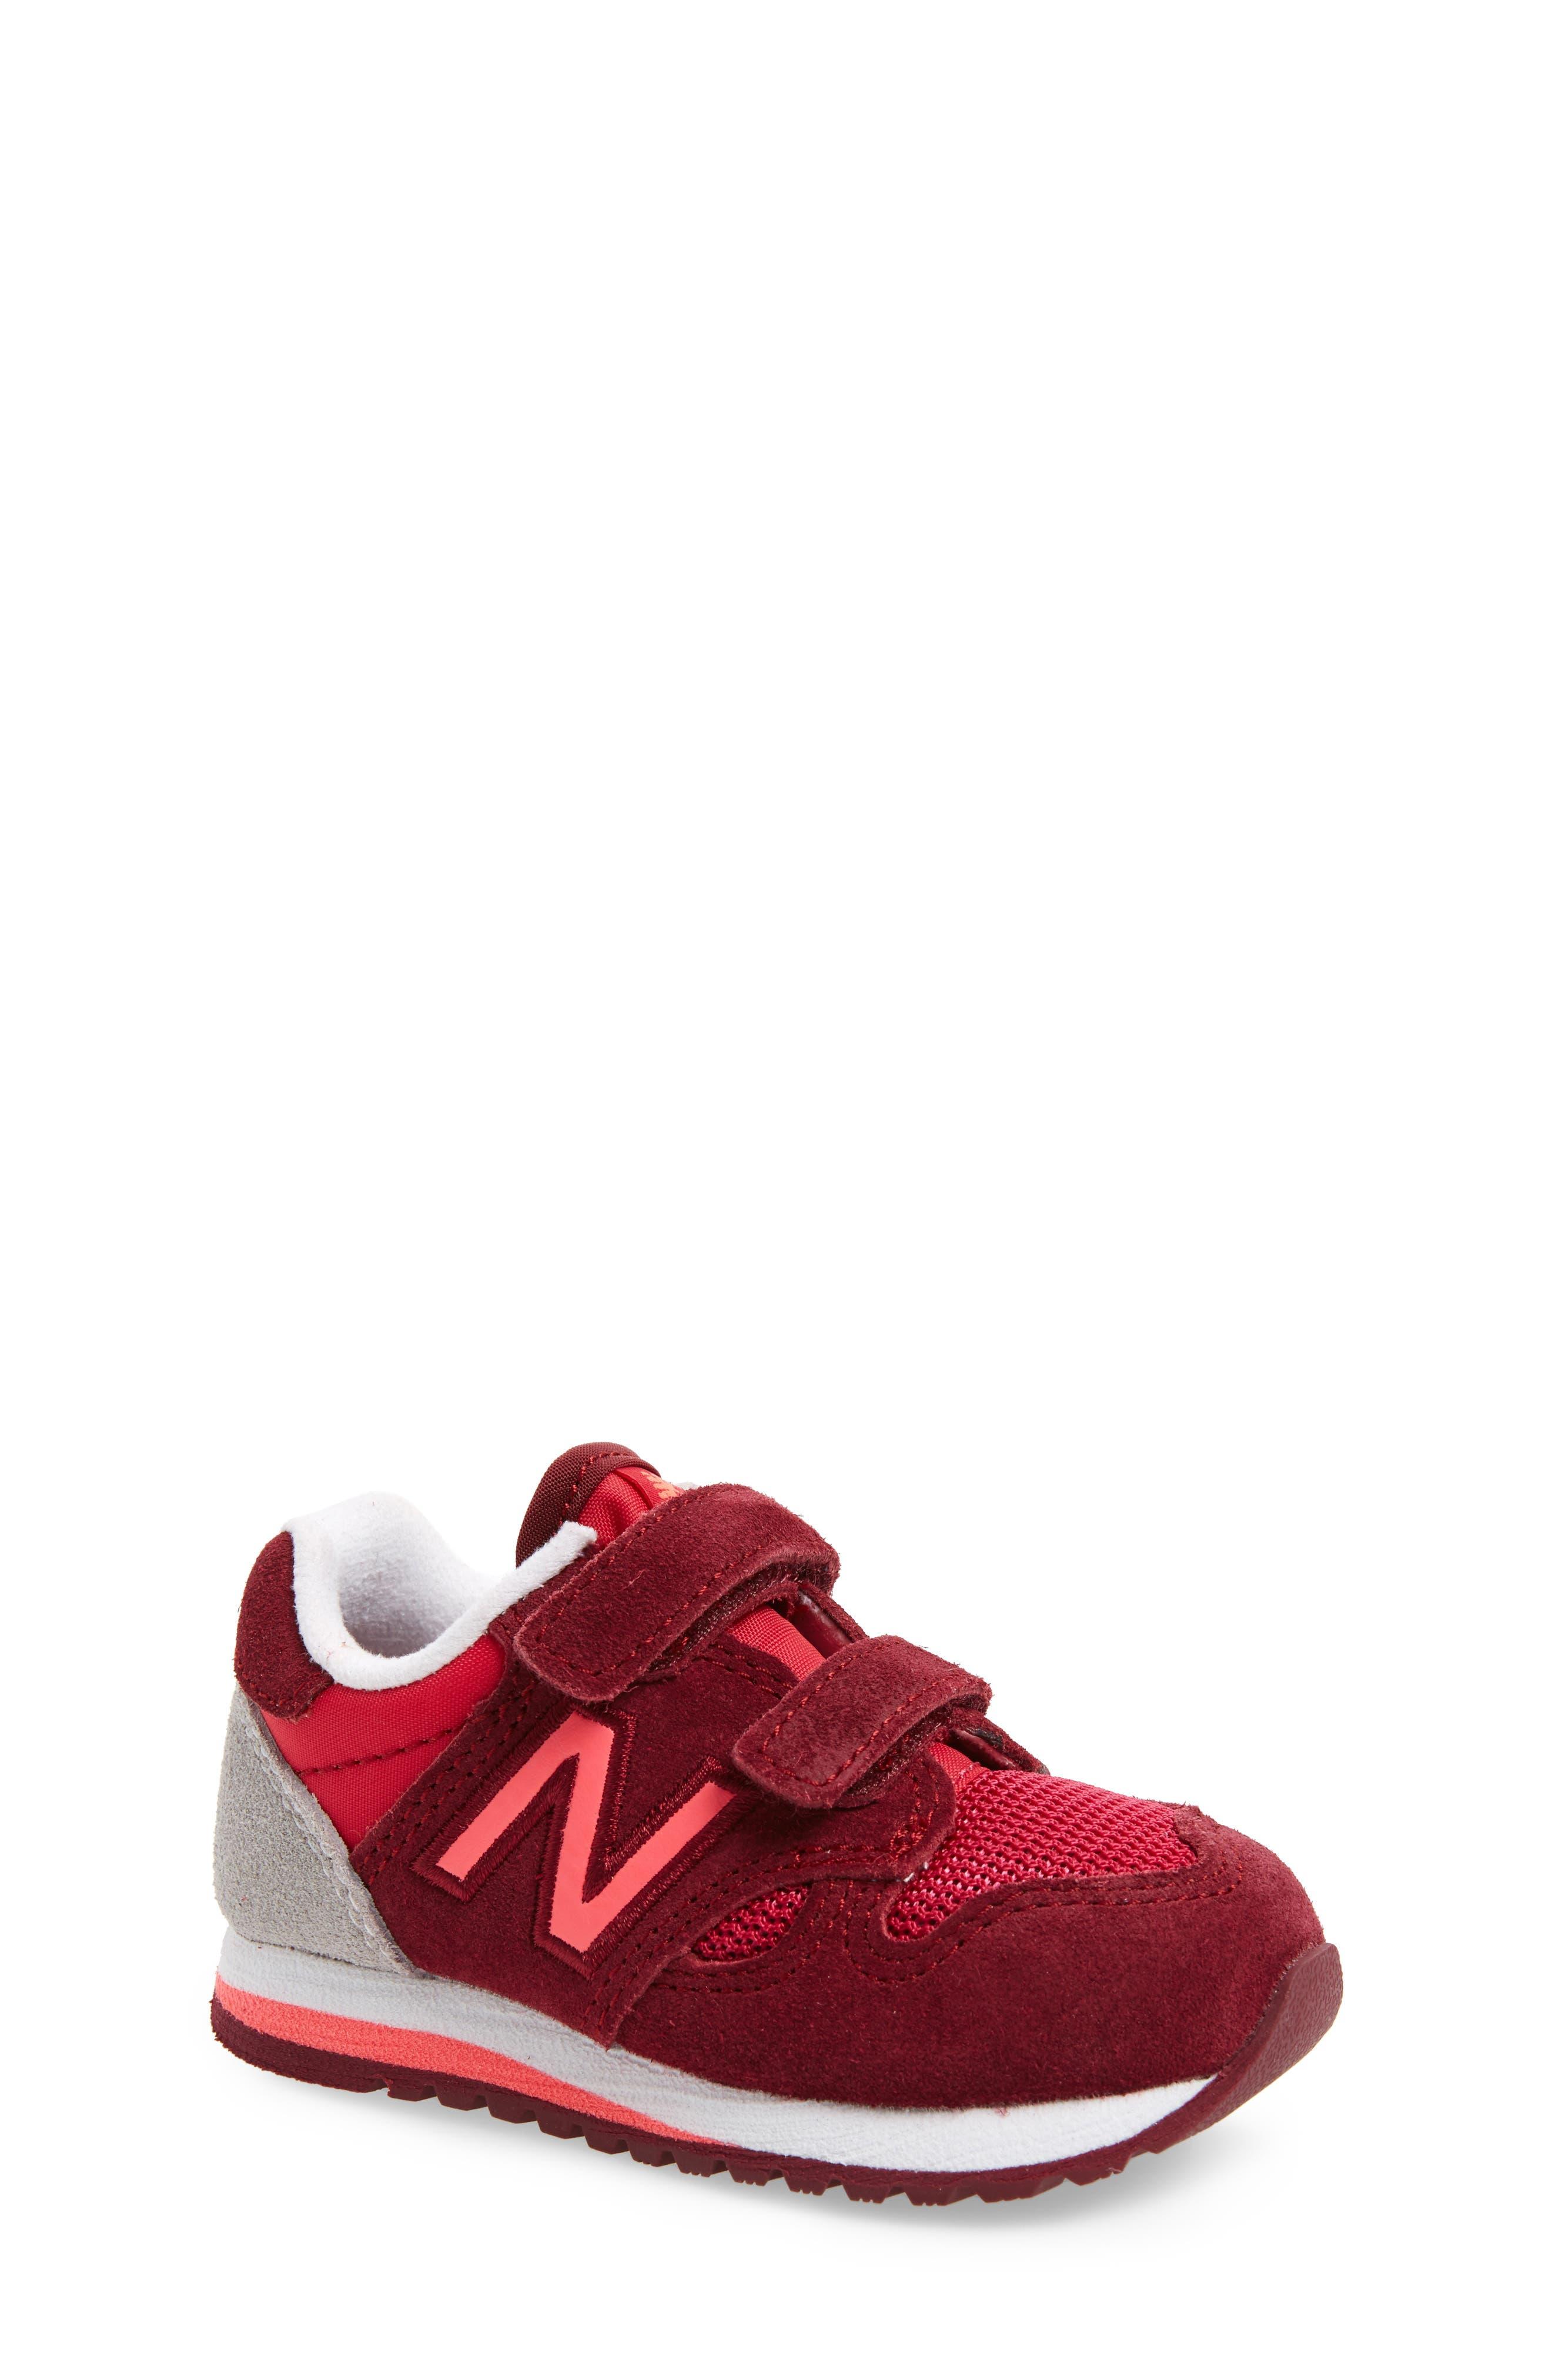 520 Sneaker,                         Main,                         color, Pink/ Purple